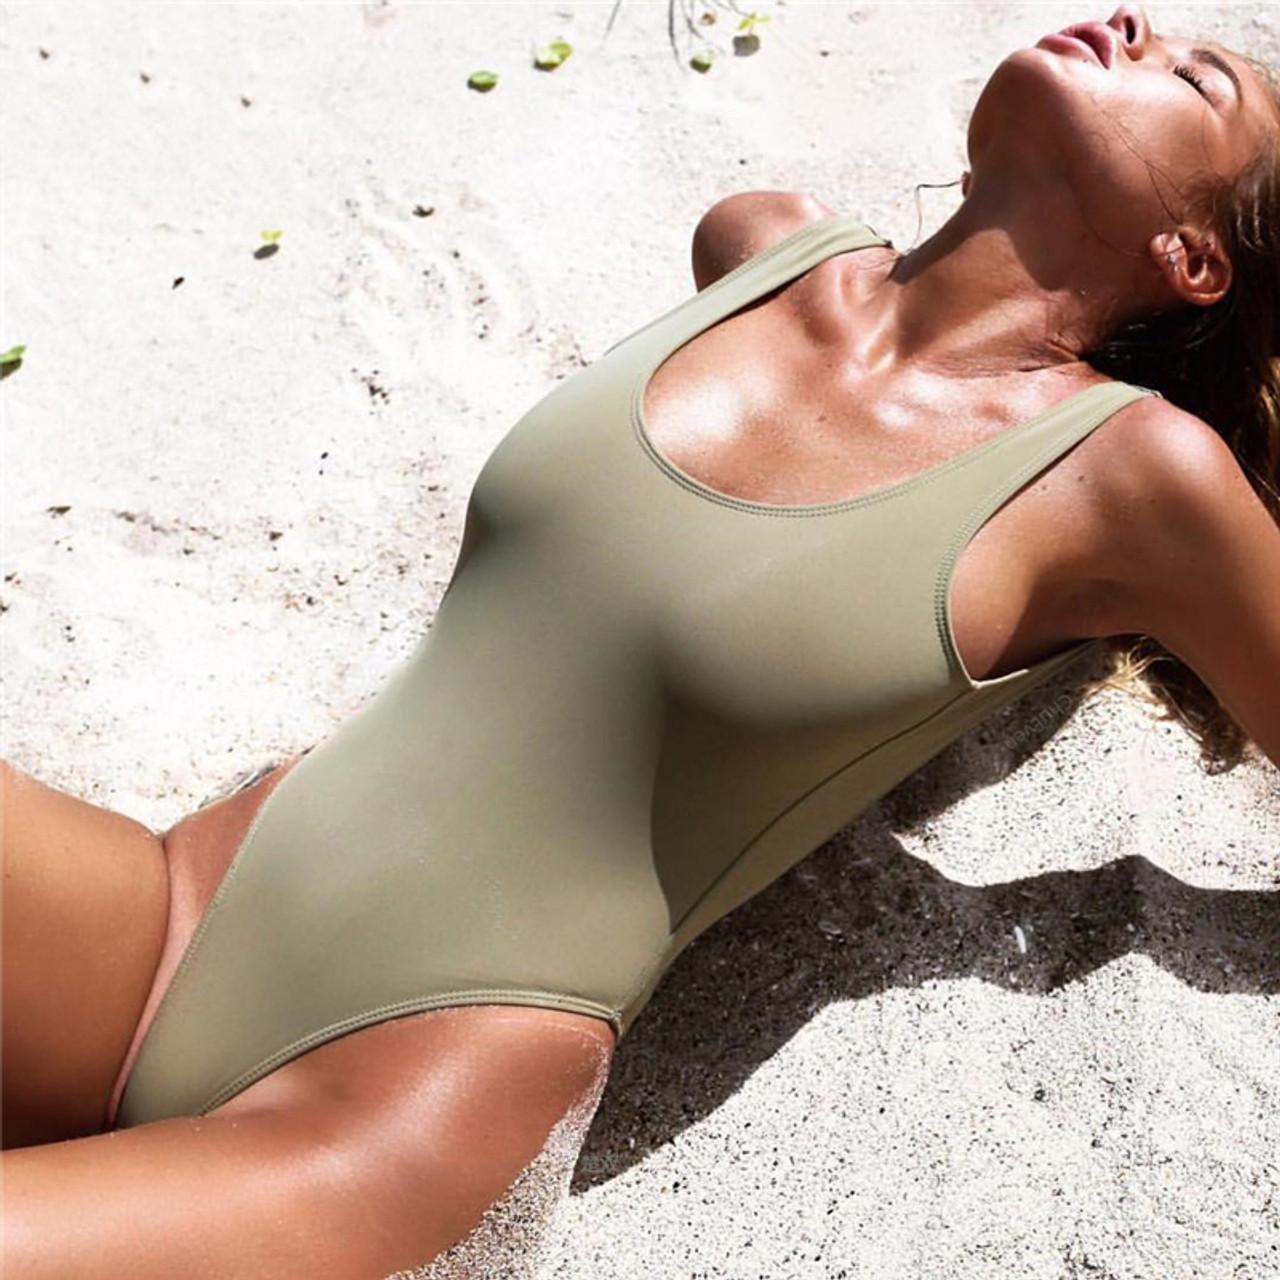 Swimsuit girls sexy #11